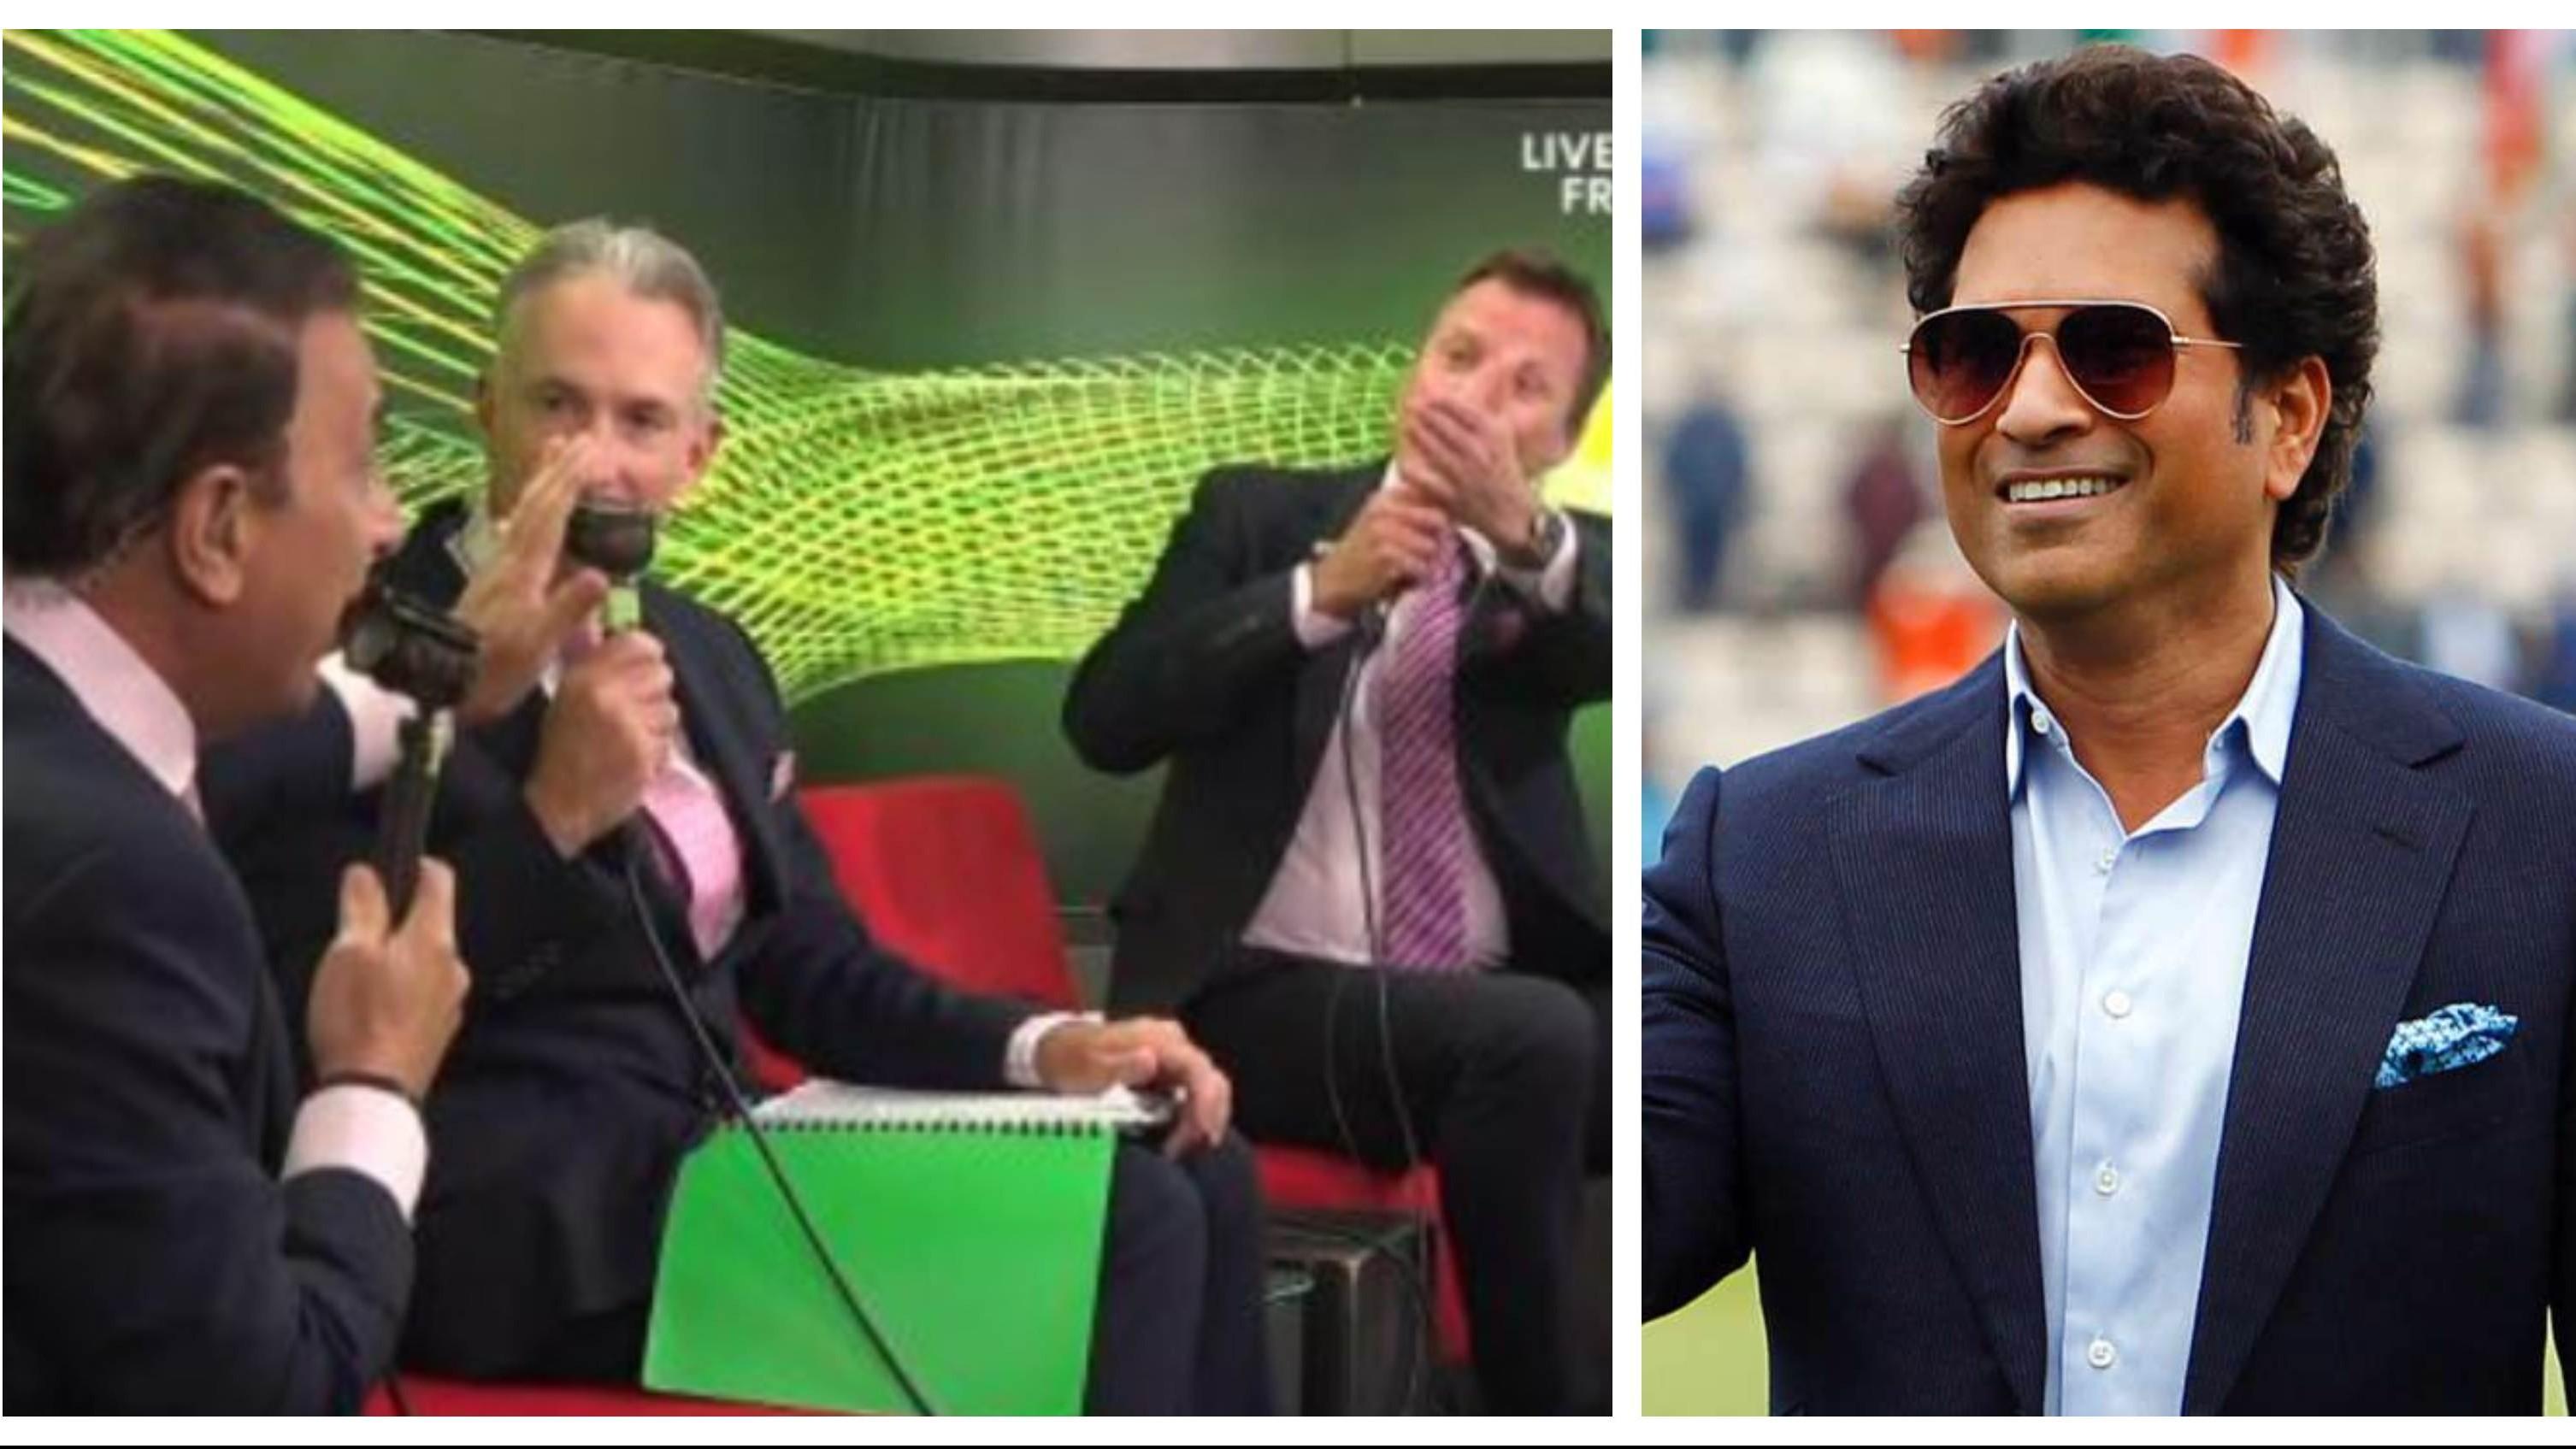 AUS v IND 2020-21: Australian commentator refers Sunil Gavaskar as Sachin Tendulkar on air